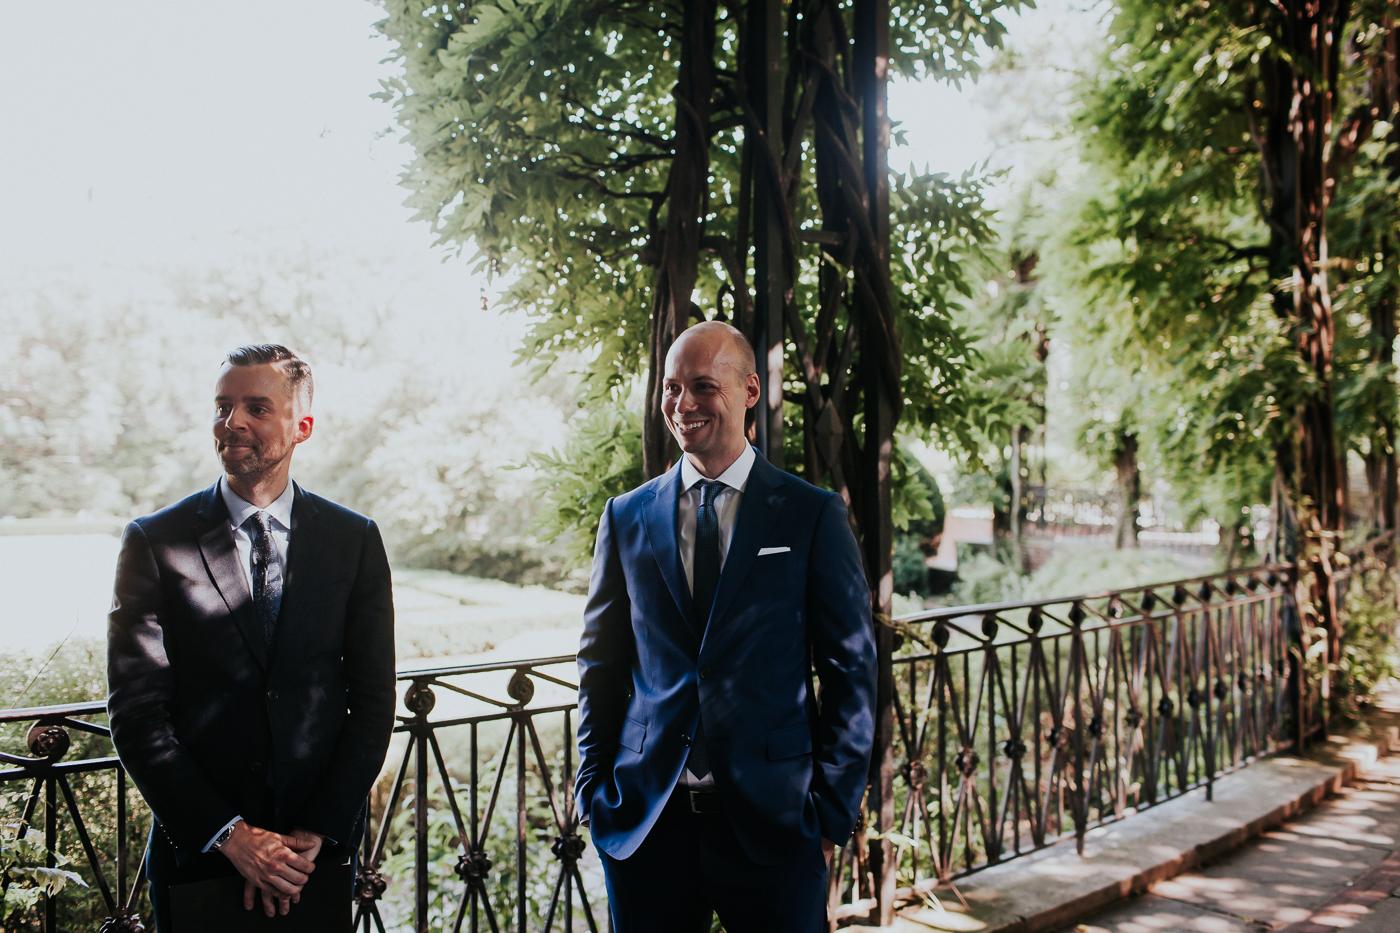 NYC-Central-Park-Conservatory-Garden-Intimate-Elopement-Documentary-Wedding-Photographer-21.jpg